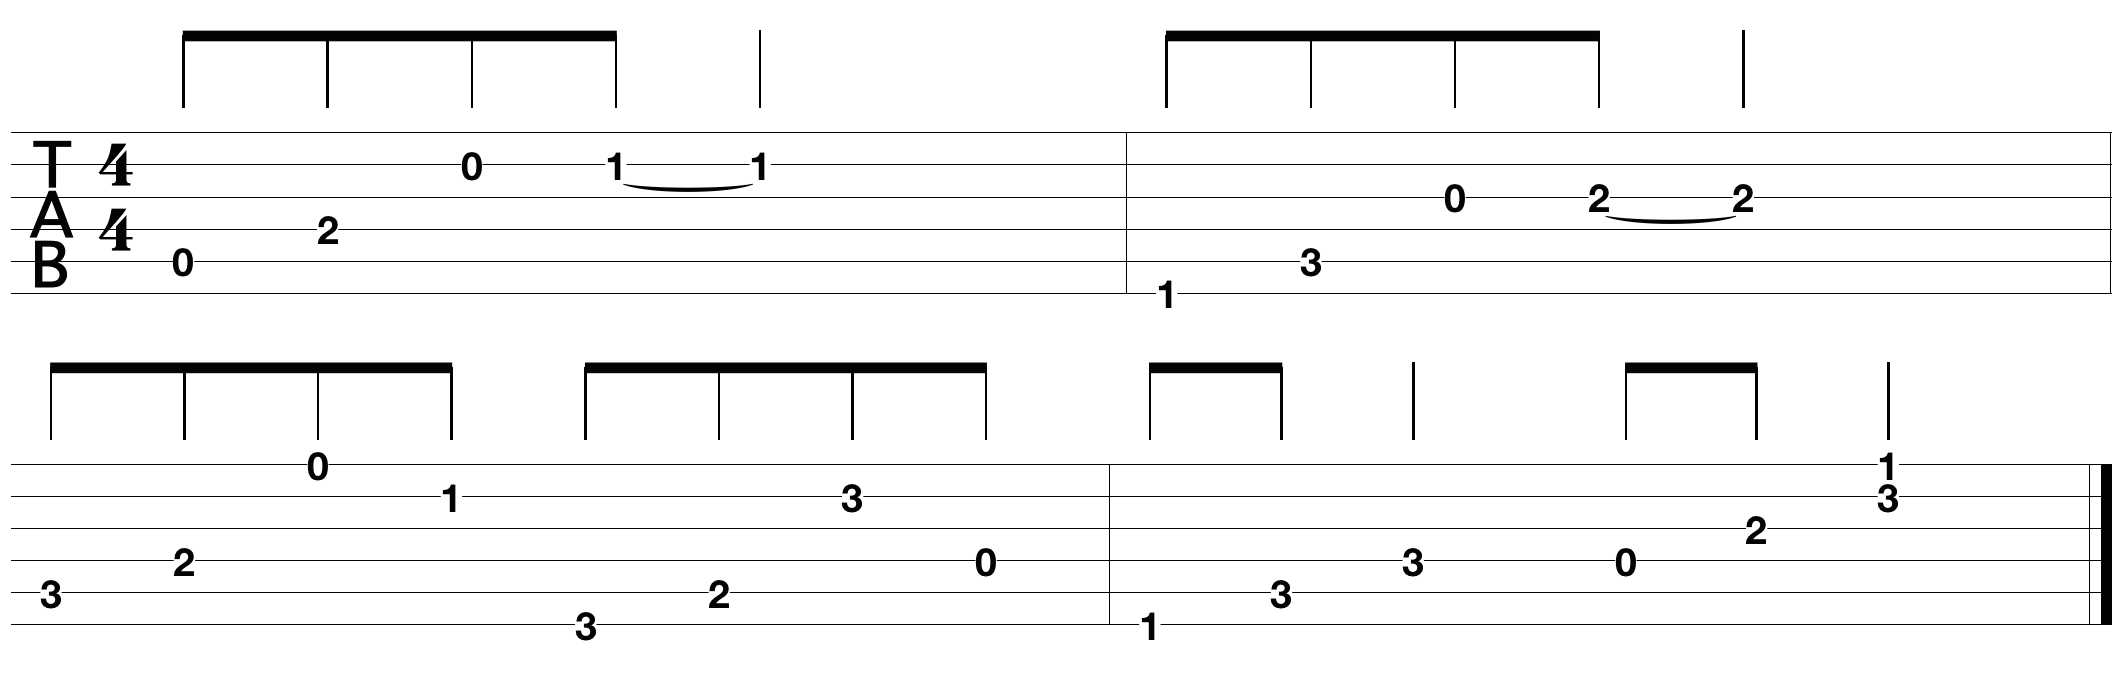 very-easy-guitar-tabs.png